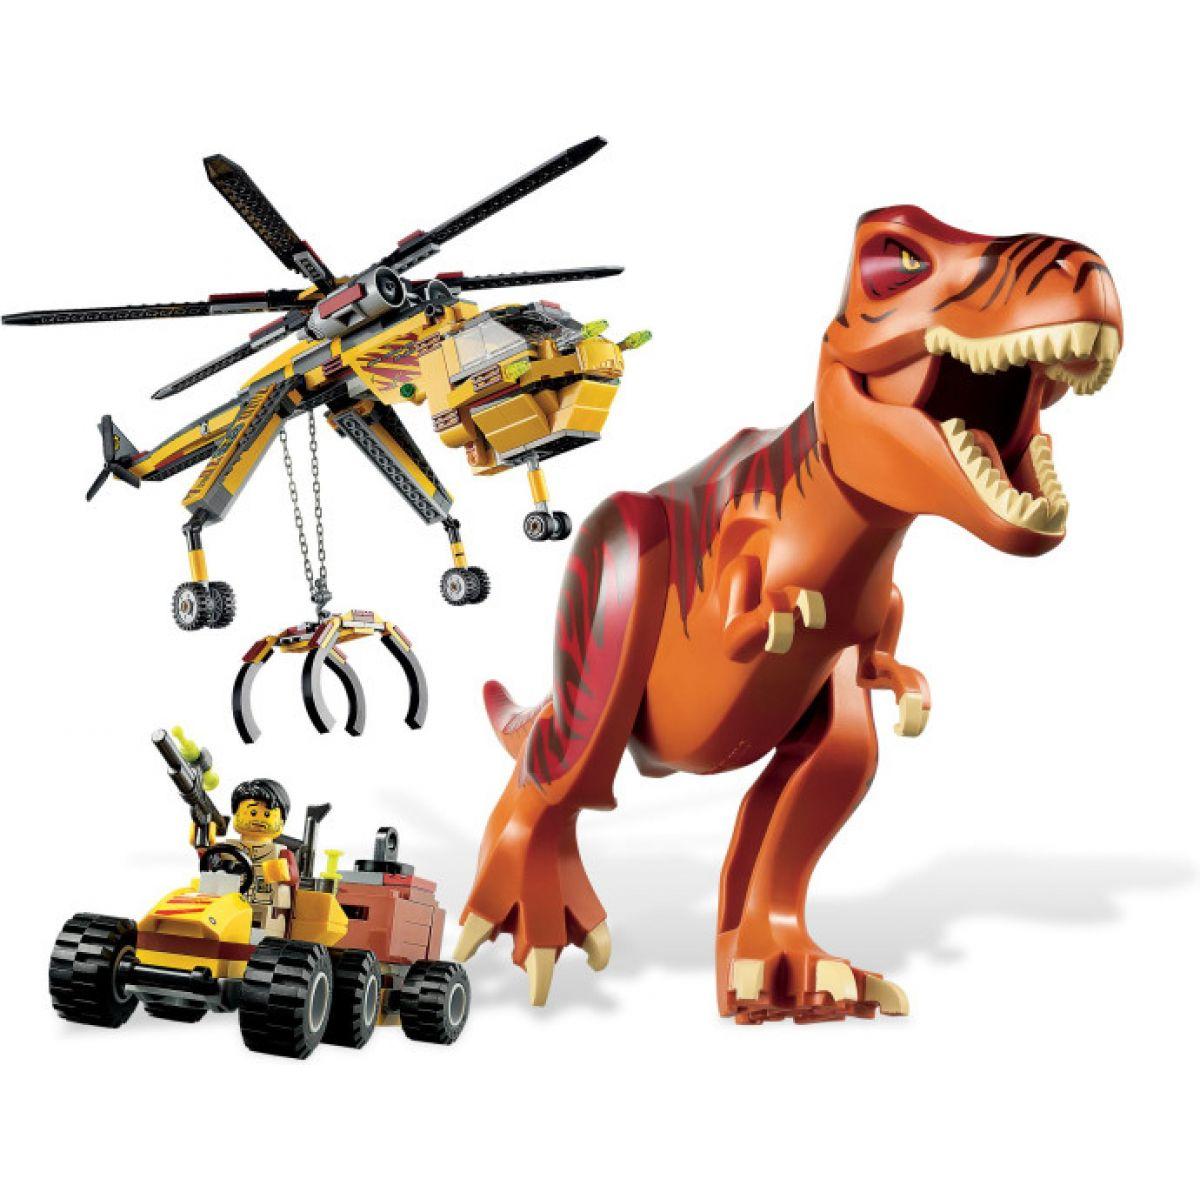 LEGO Dino 5886 Lovec T-Rexů #6